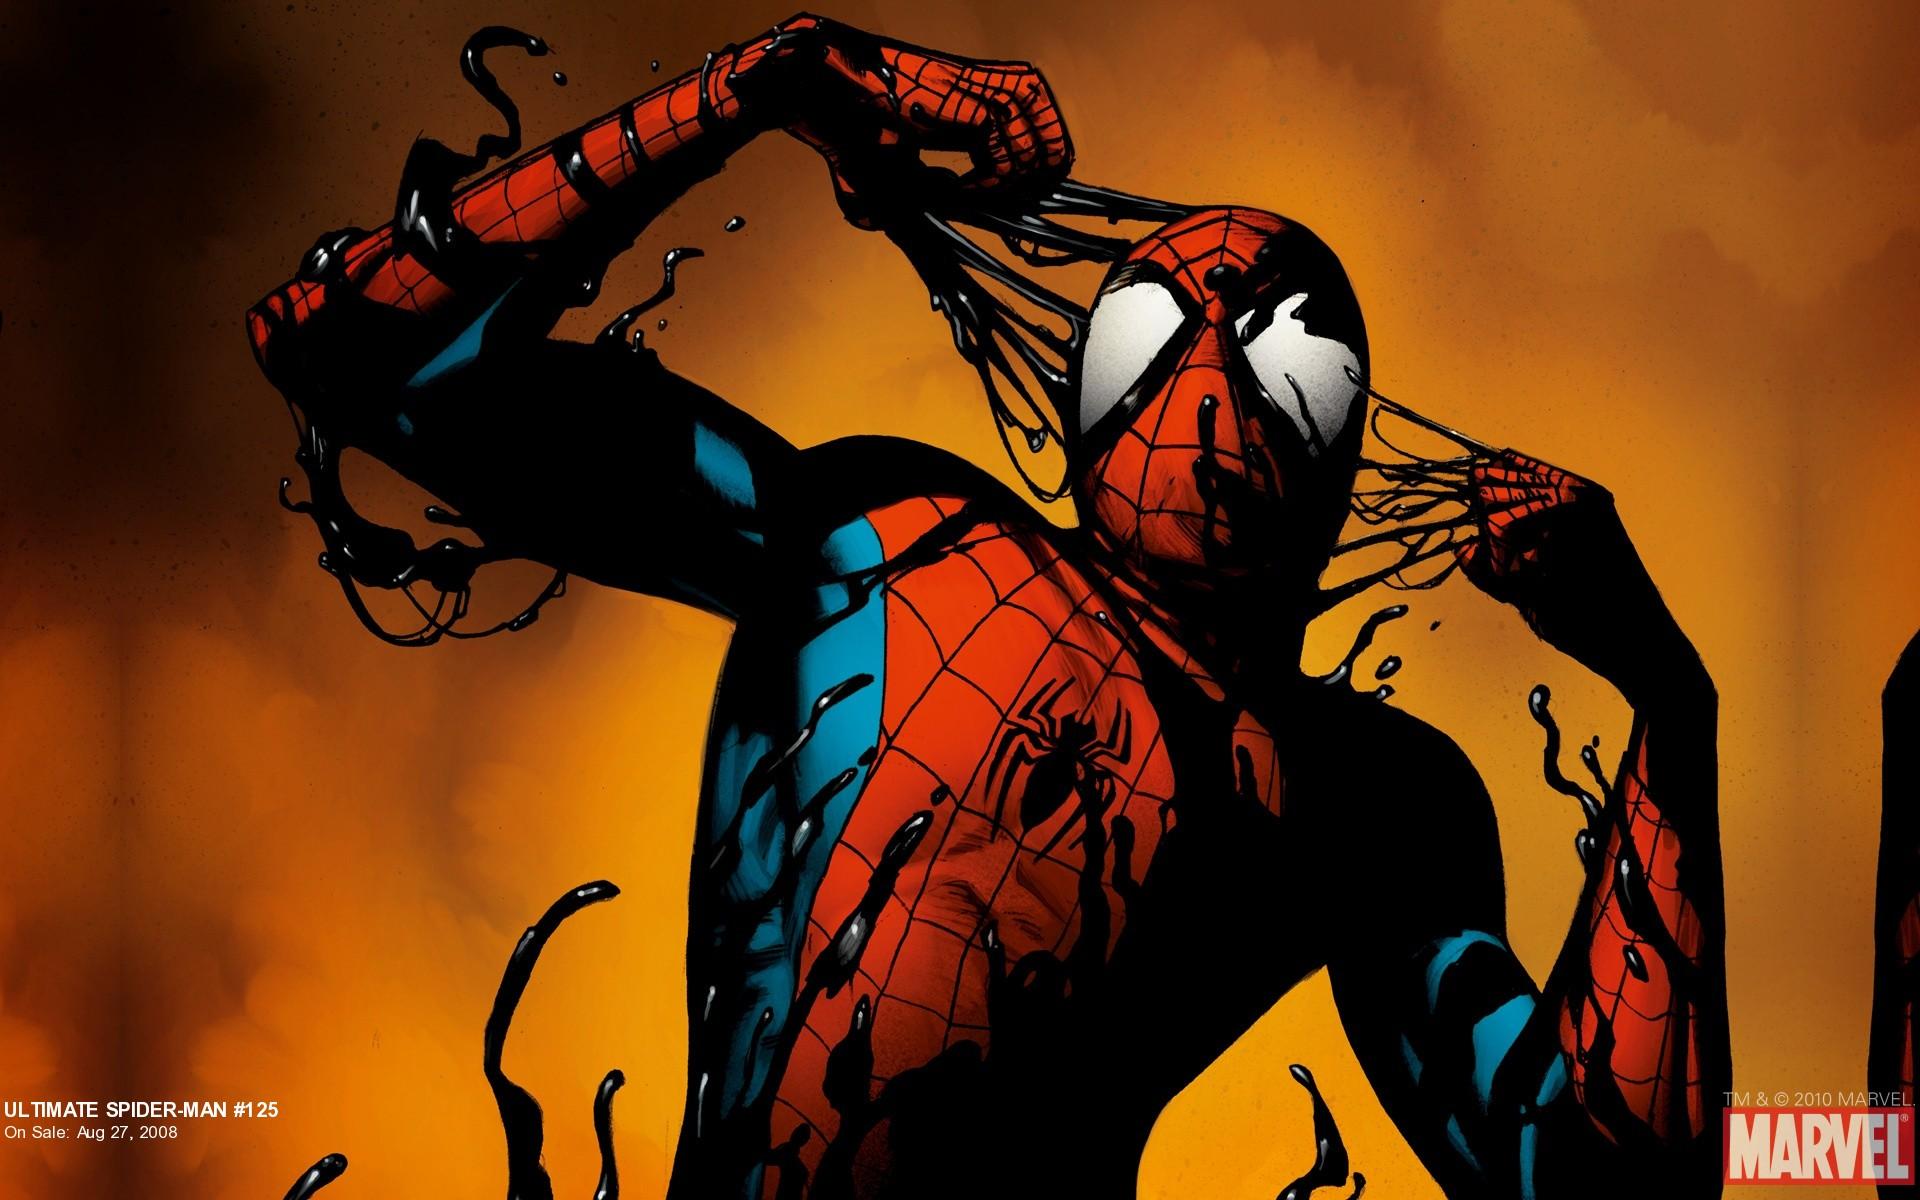 Spiderman comics spider-man superhero wallpaper | 1920x1200